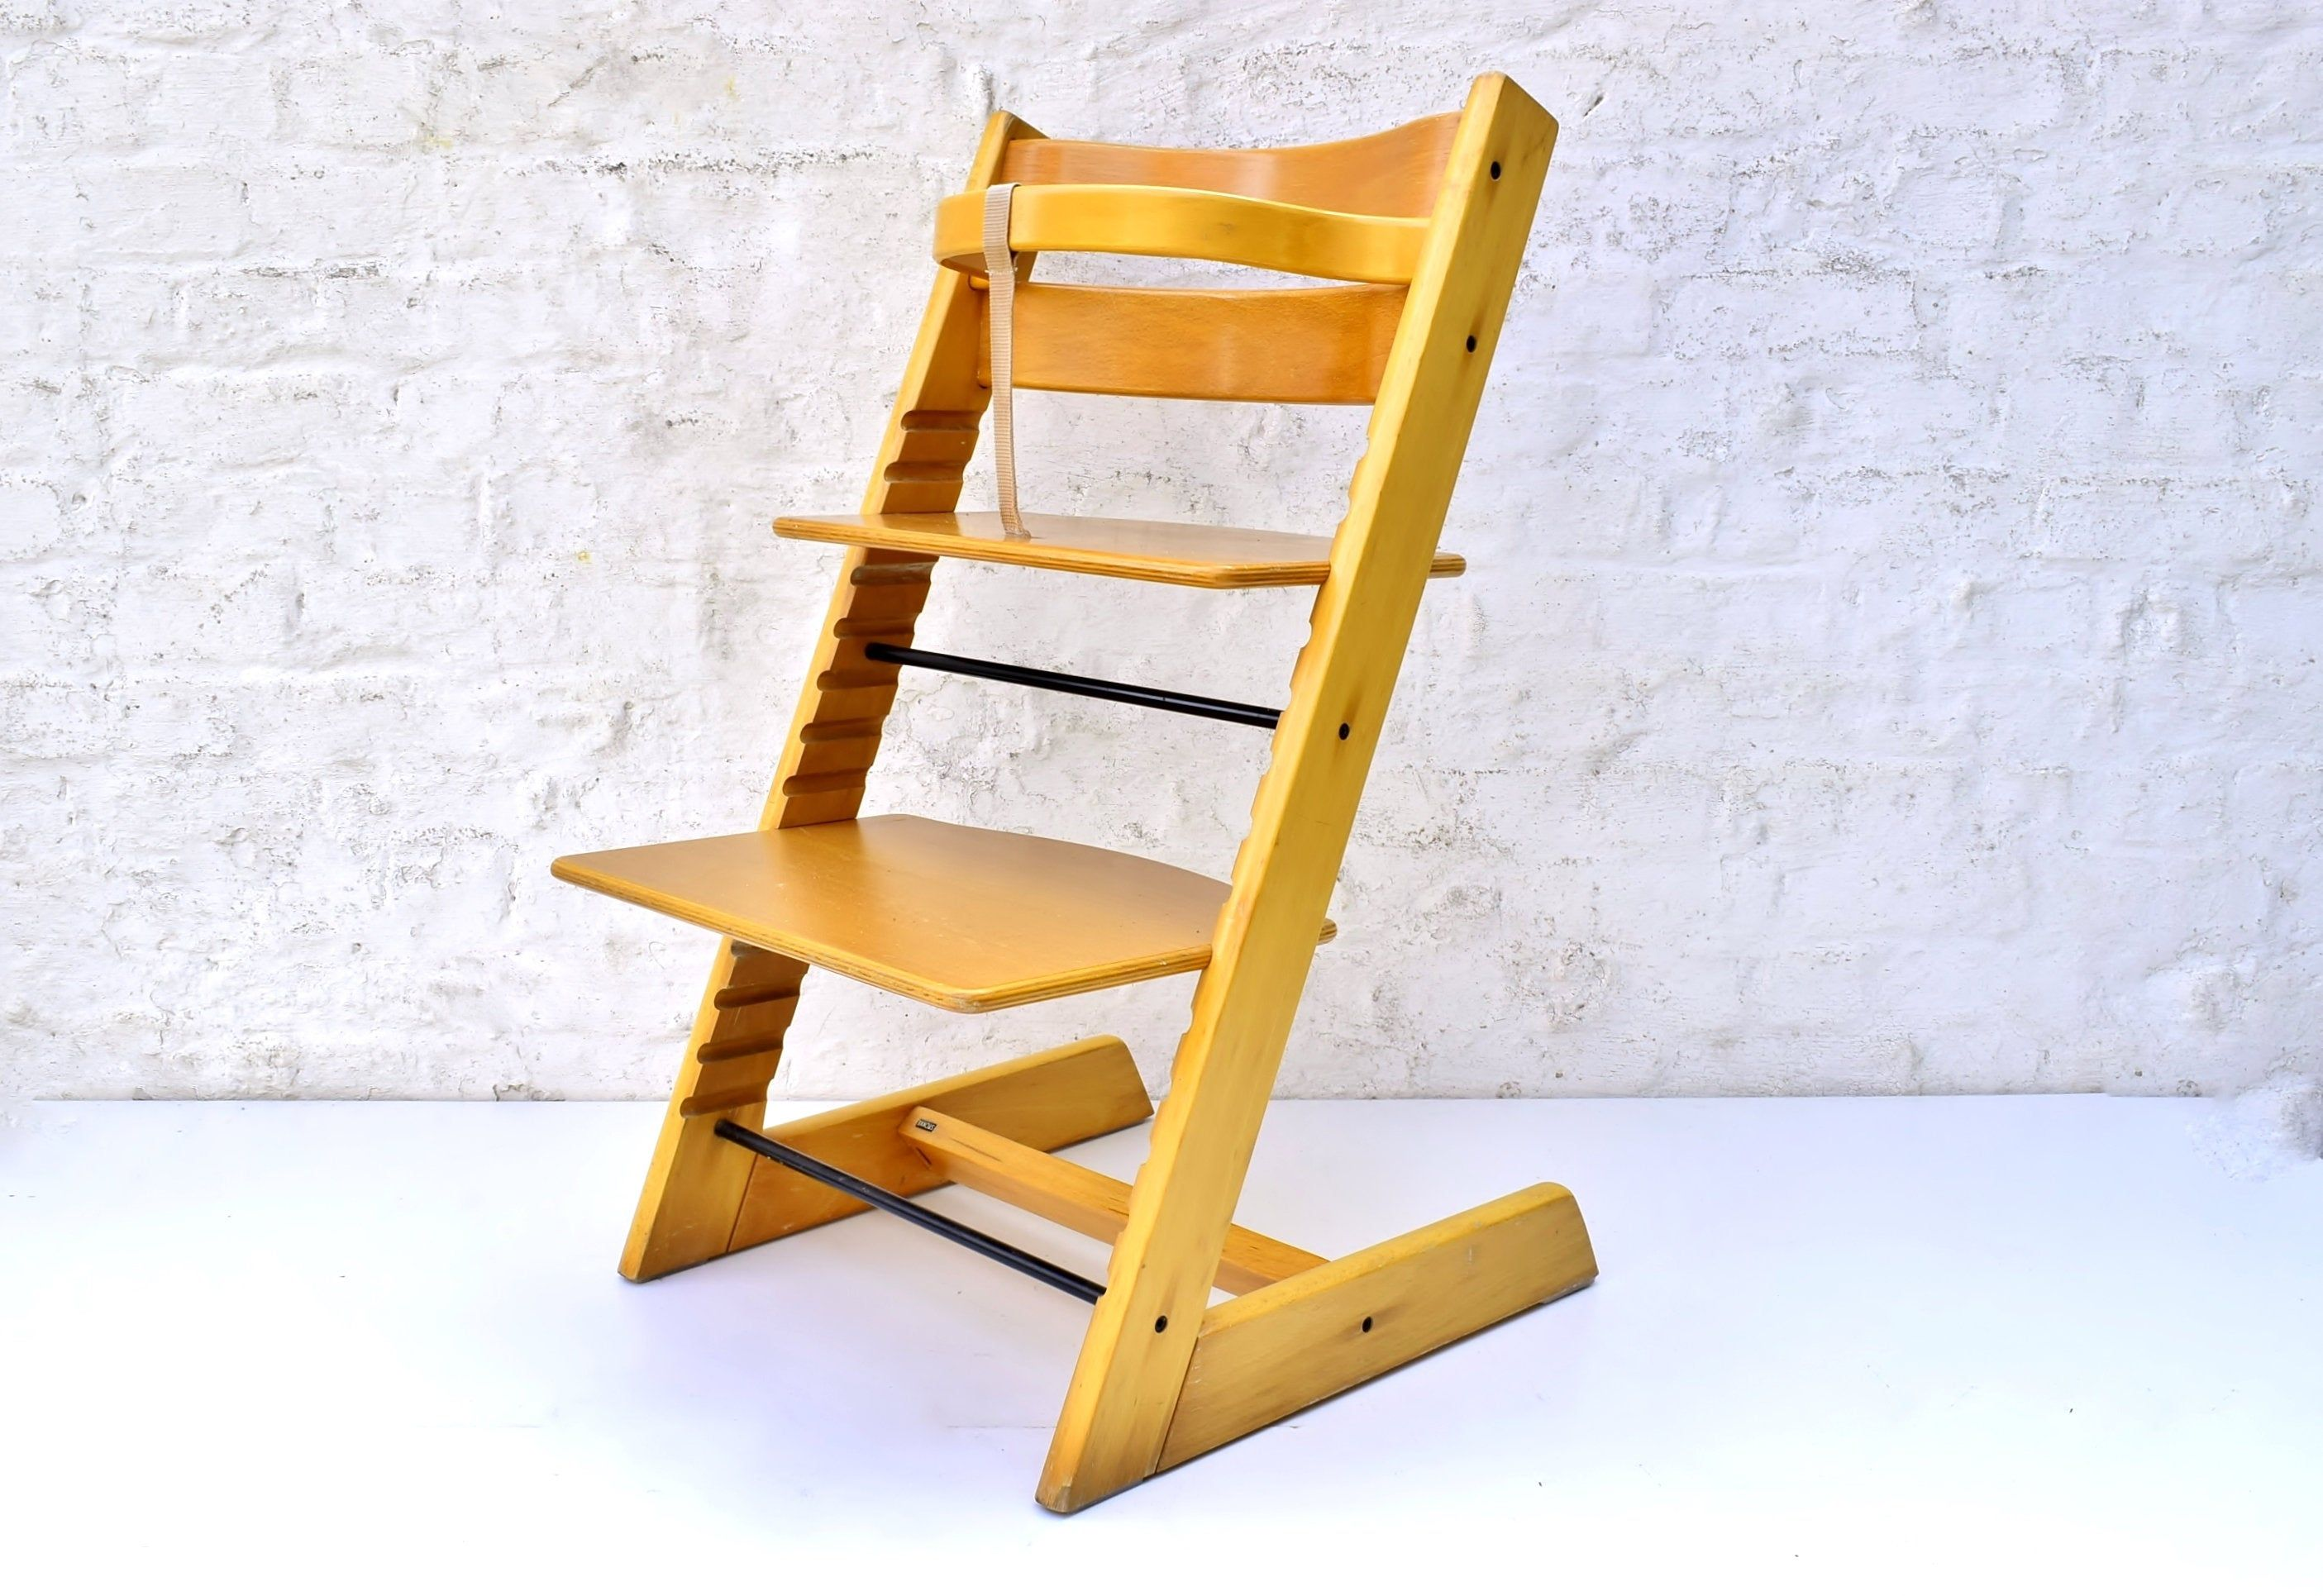 Vintage Stokke Tripp Trapp Chair Retro High Kinderzeat Height Adjustable With Wood Rail Norwegian Design Childrens Furniture Before 2000 Retro Chair Childrens Furniture Norwegian Design